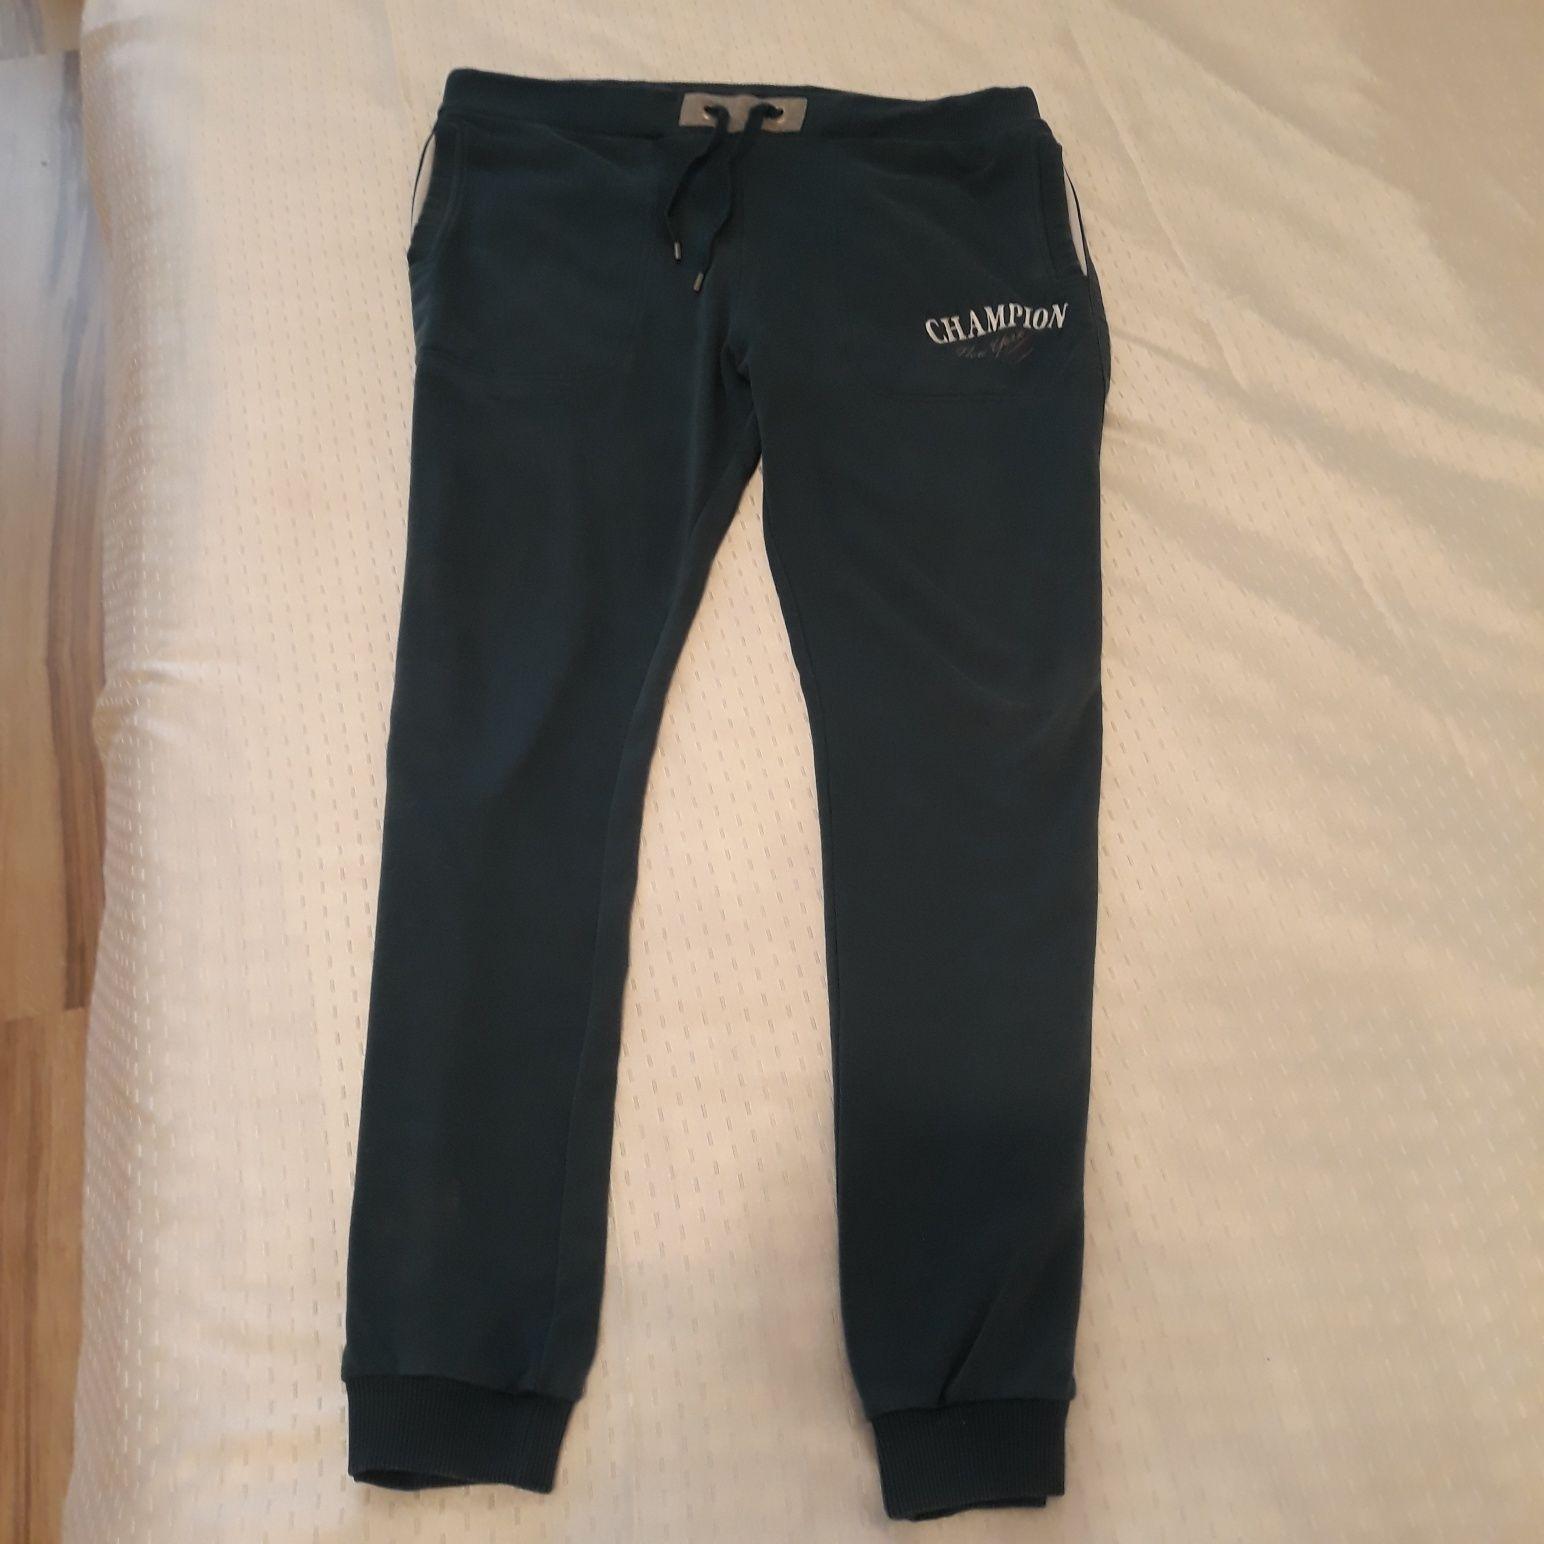 Pantaloni Champion 33ron